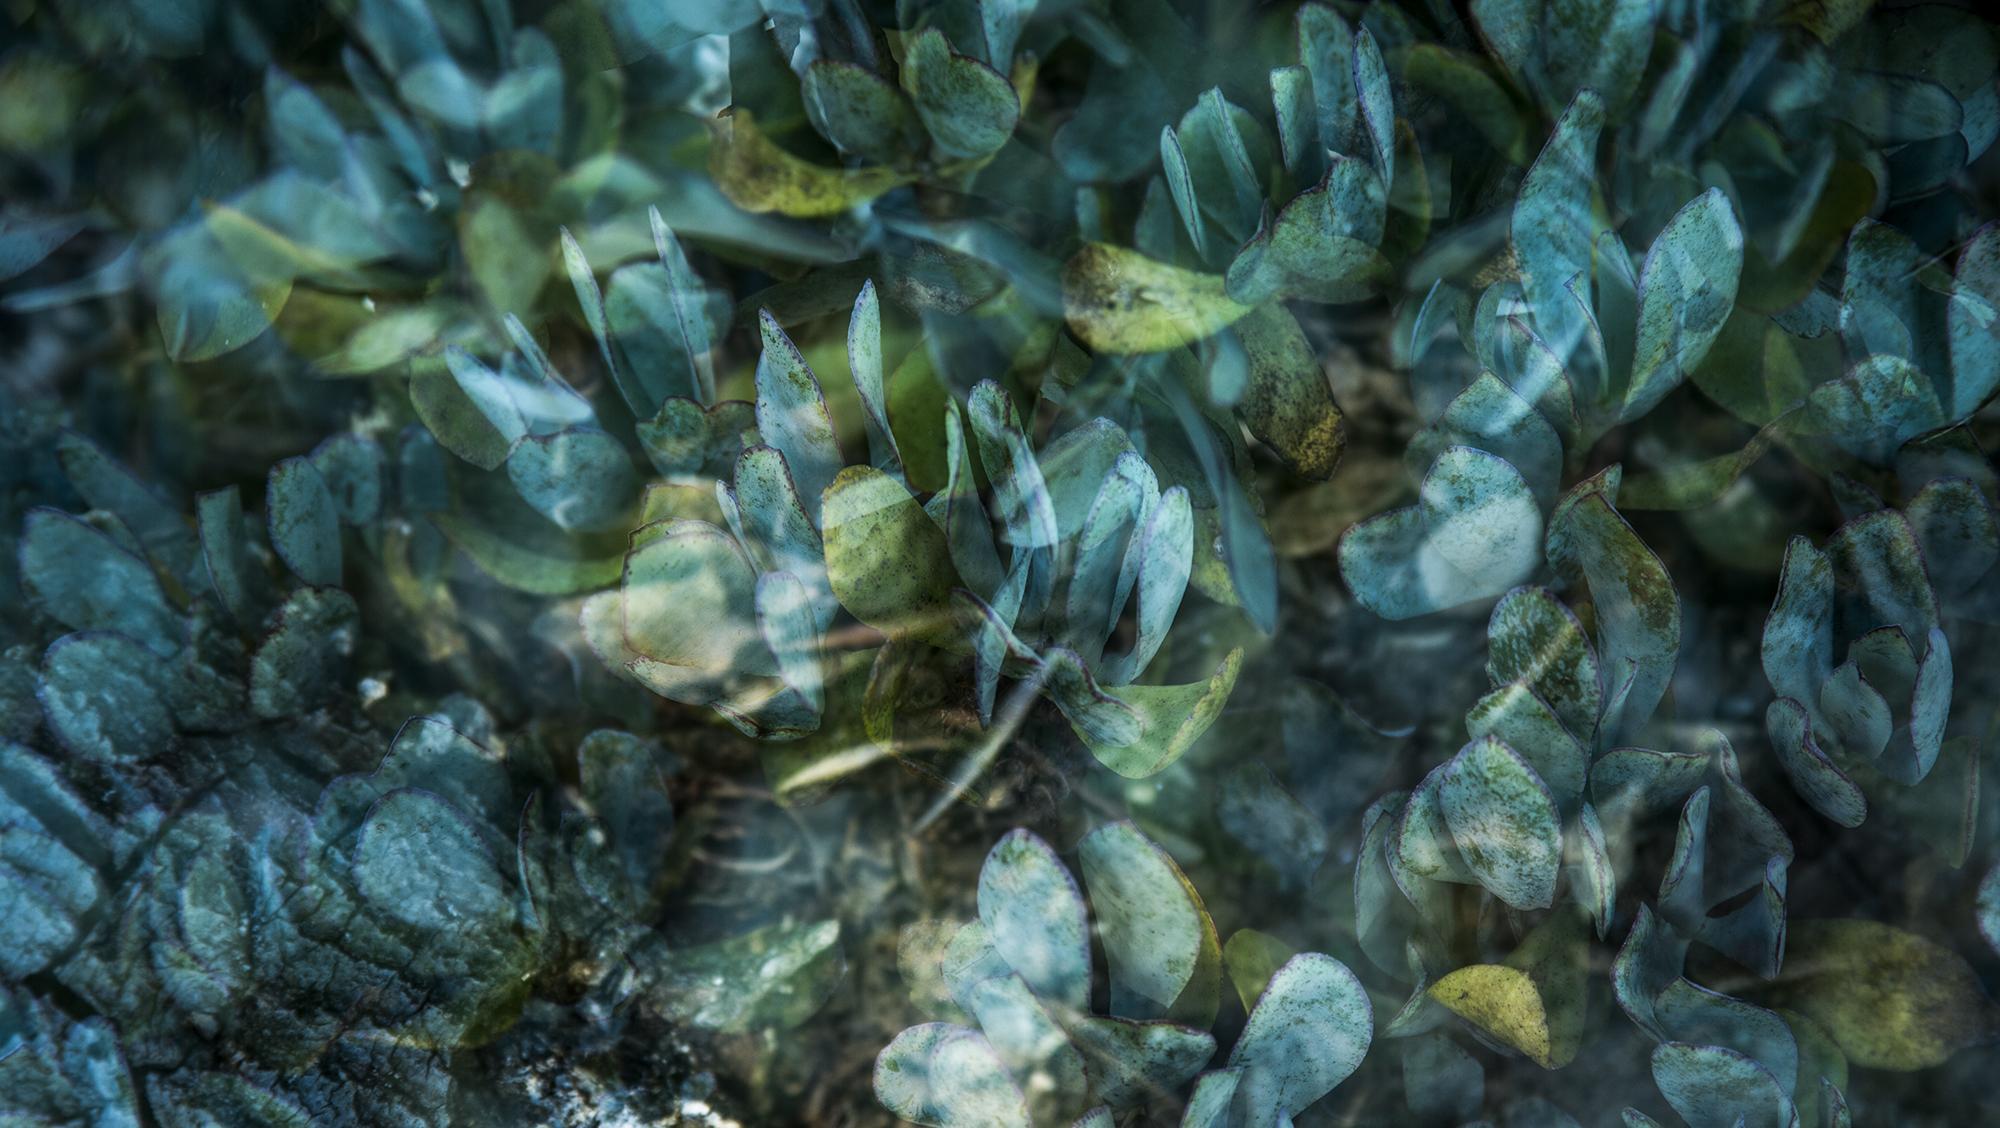 Blue Green Succulent Study 1